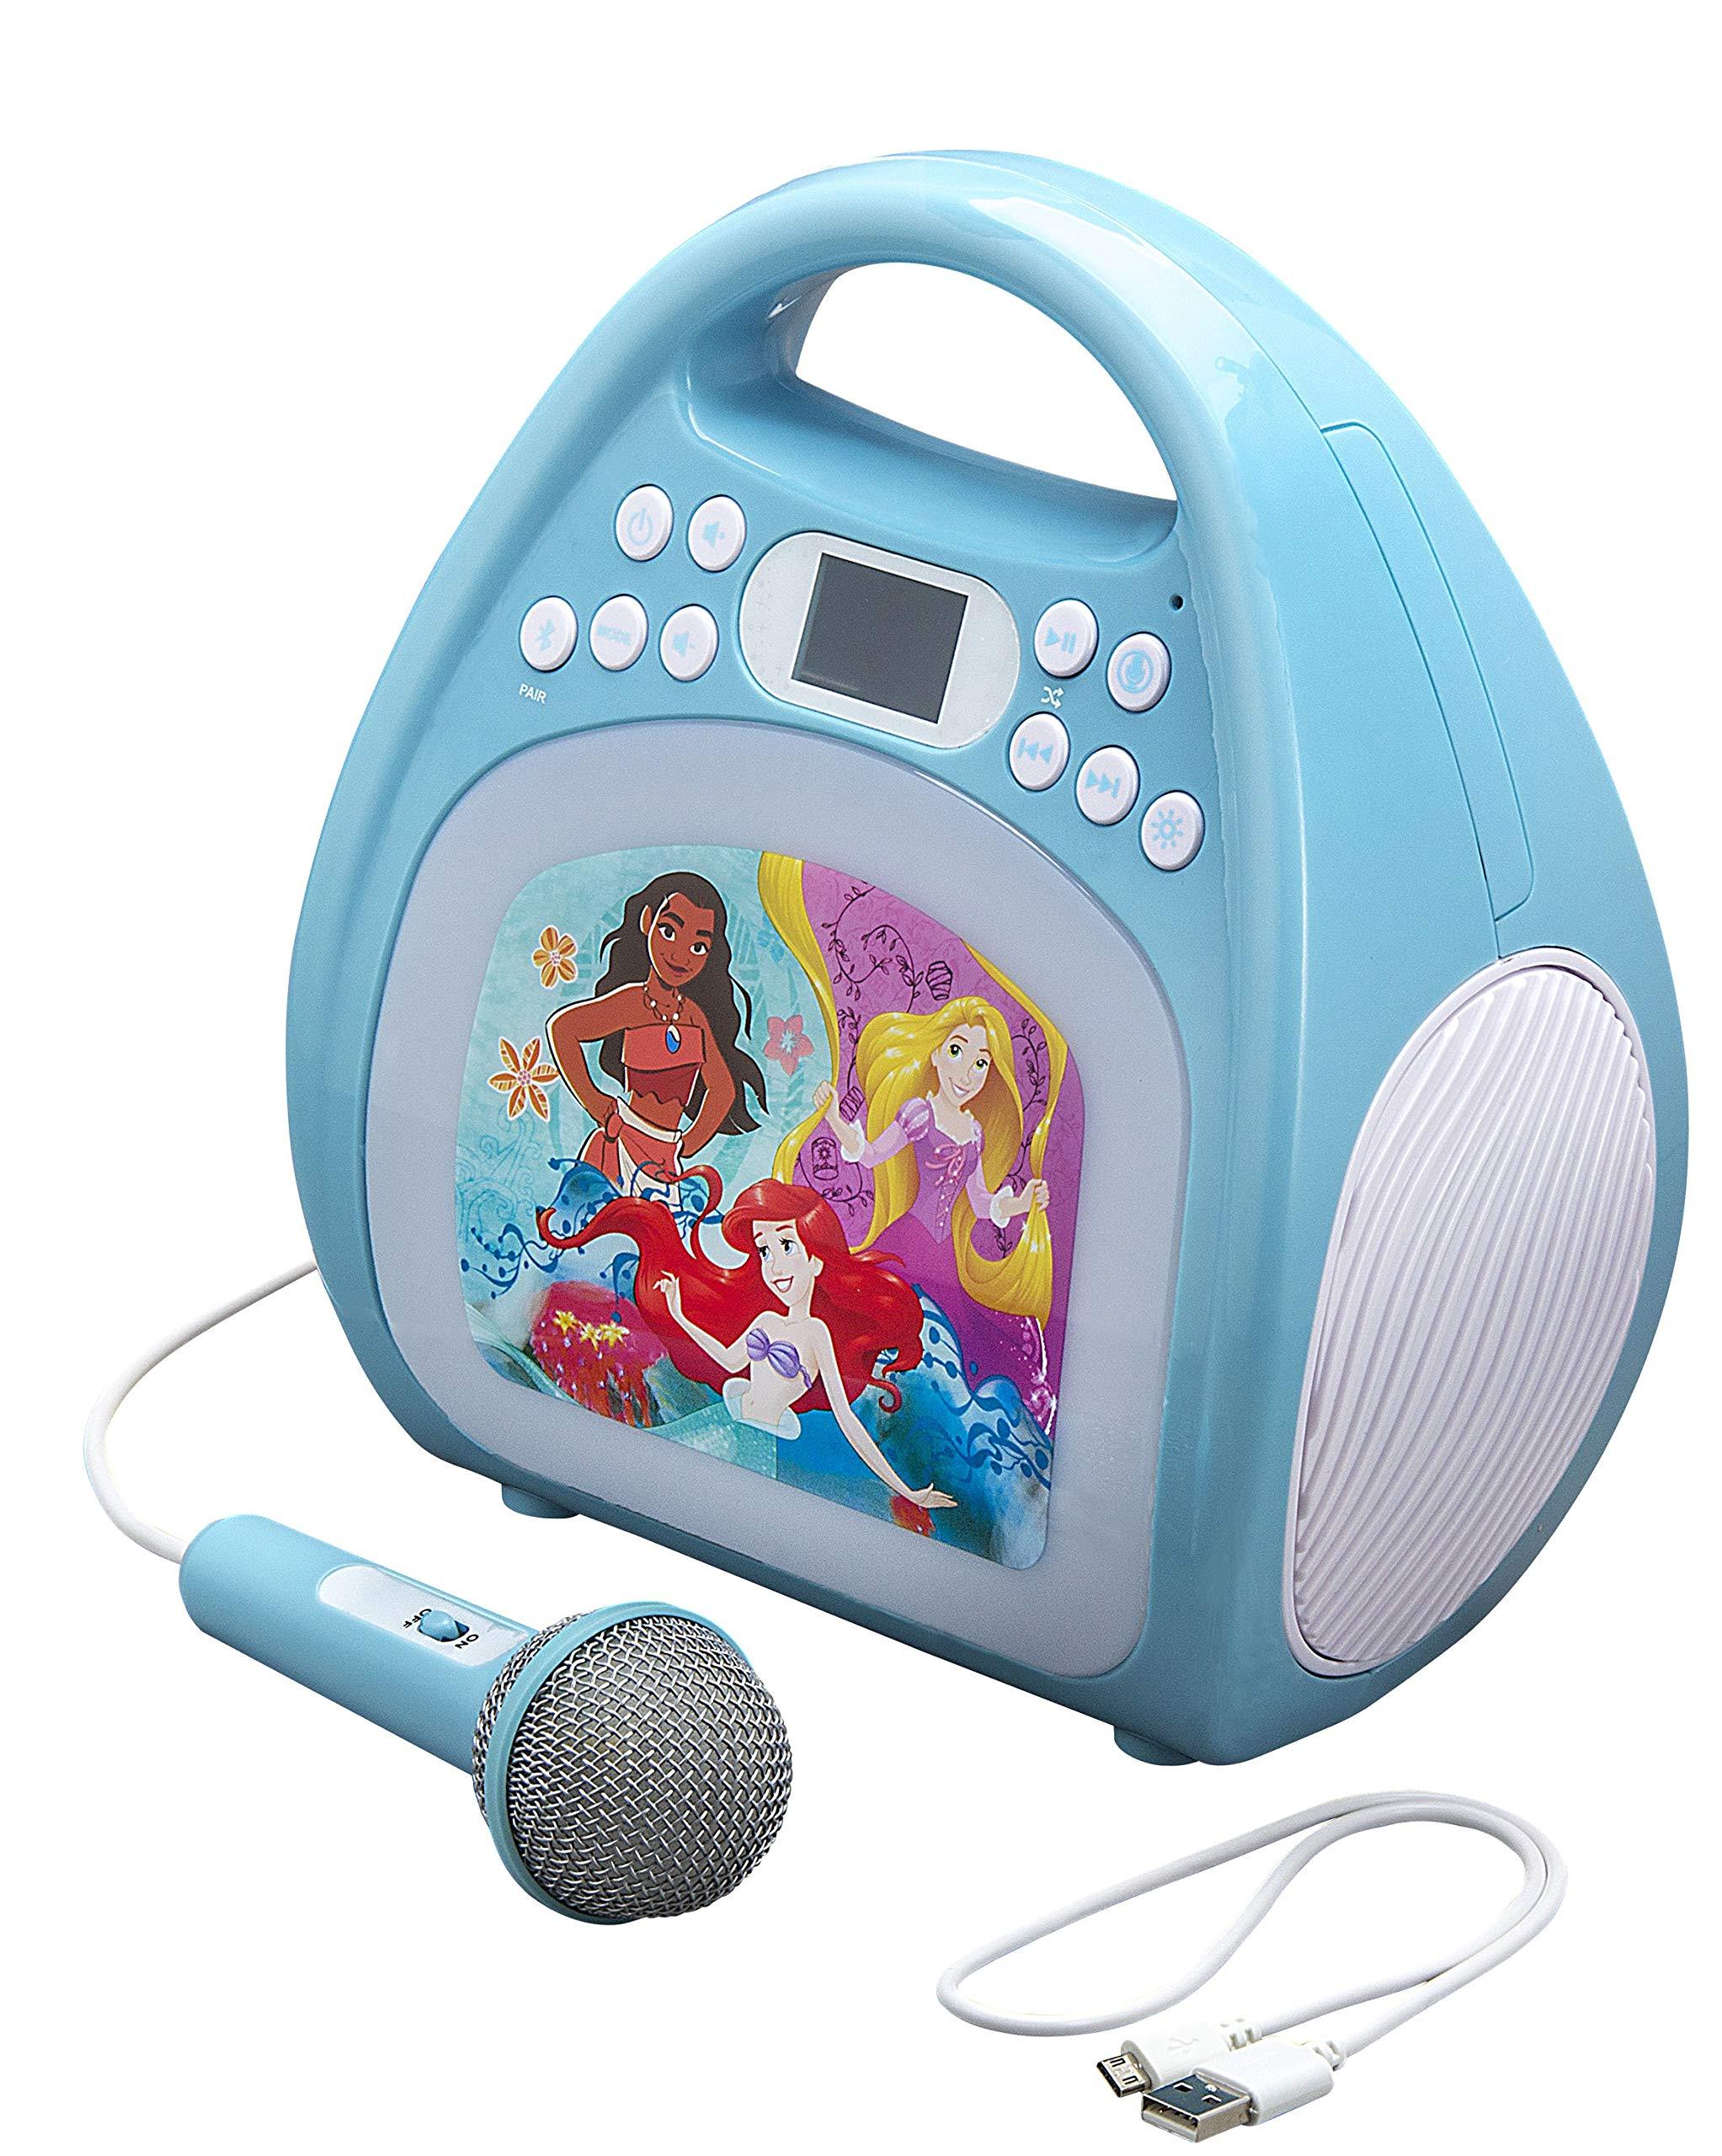 kiddesigns, inc. Disney Bluetooth MP3 Karaoke with Light Show - Disney Princesses by kiddesigns, inc. (Image #2)